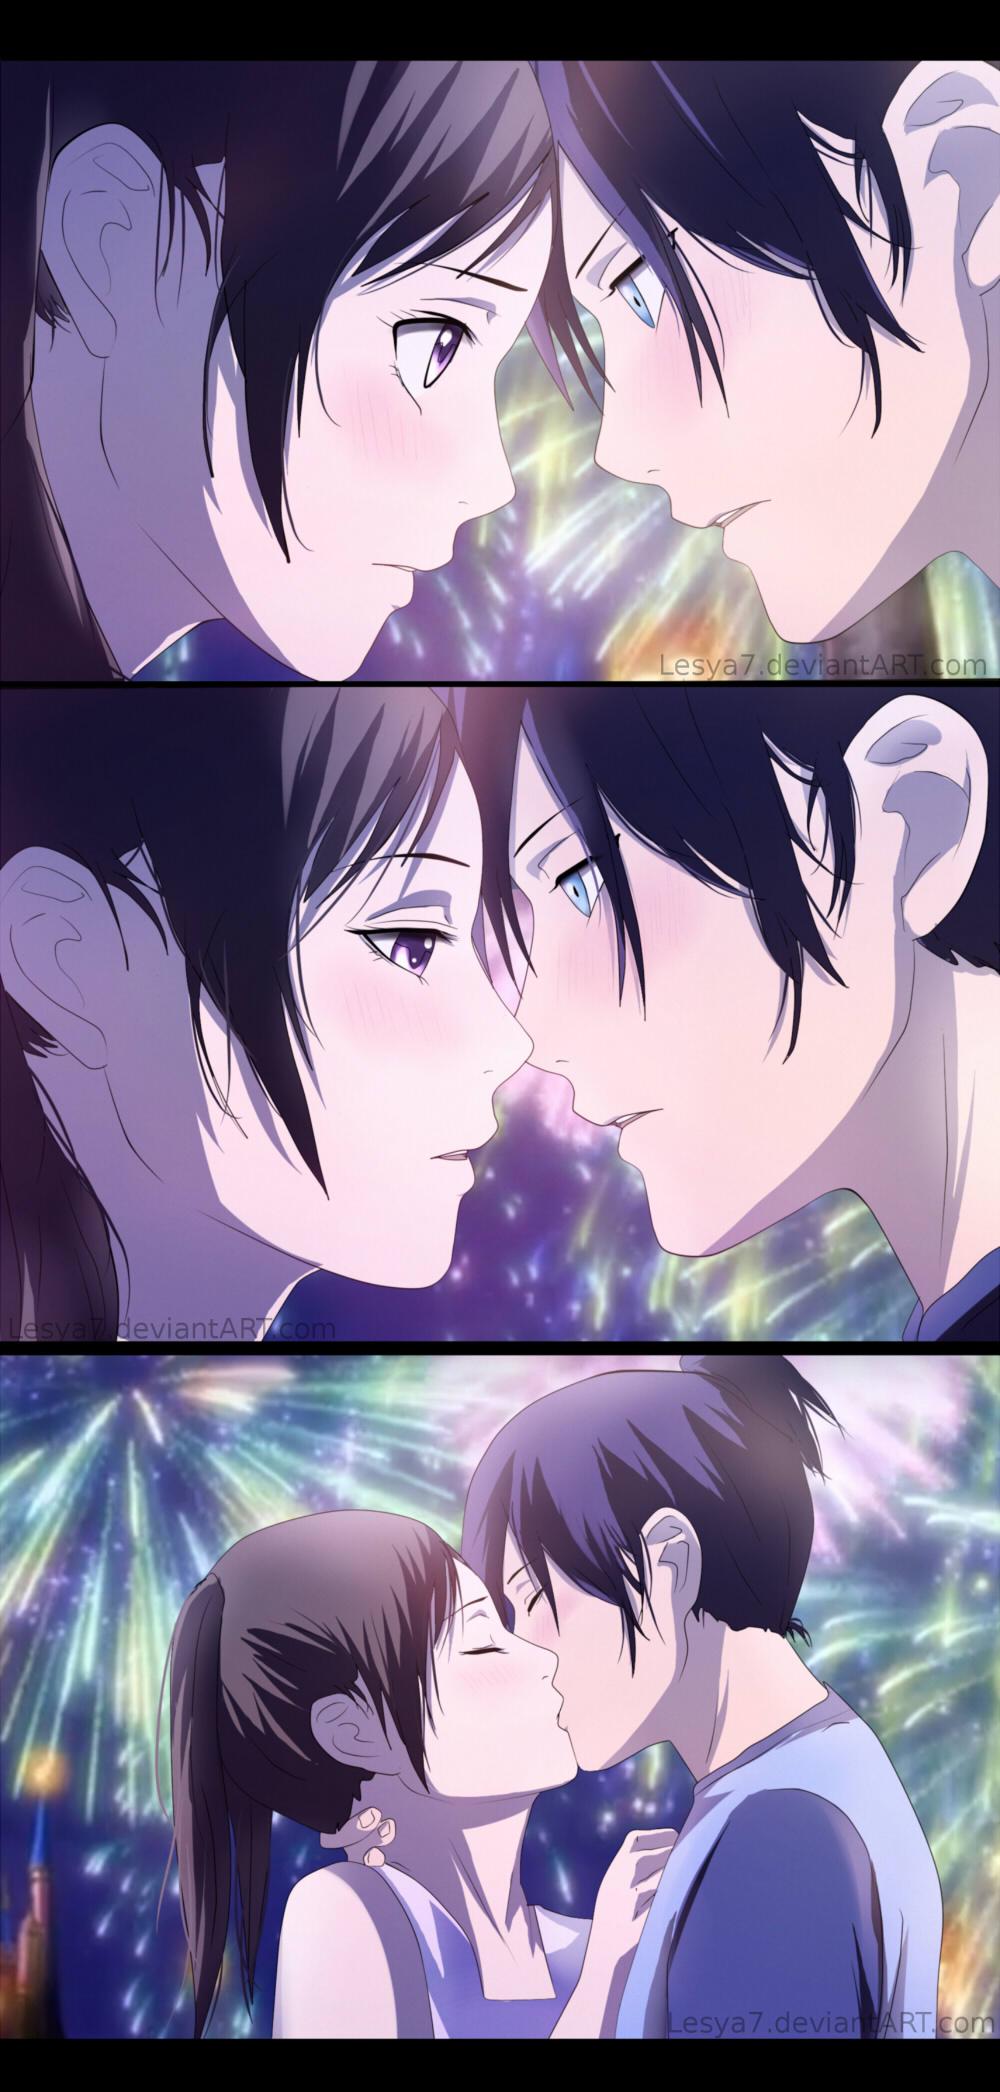 noragami yato and hiyori relationship help